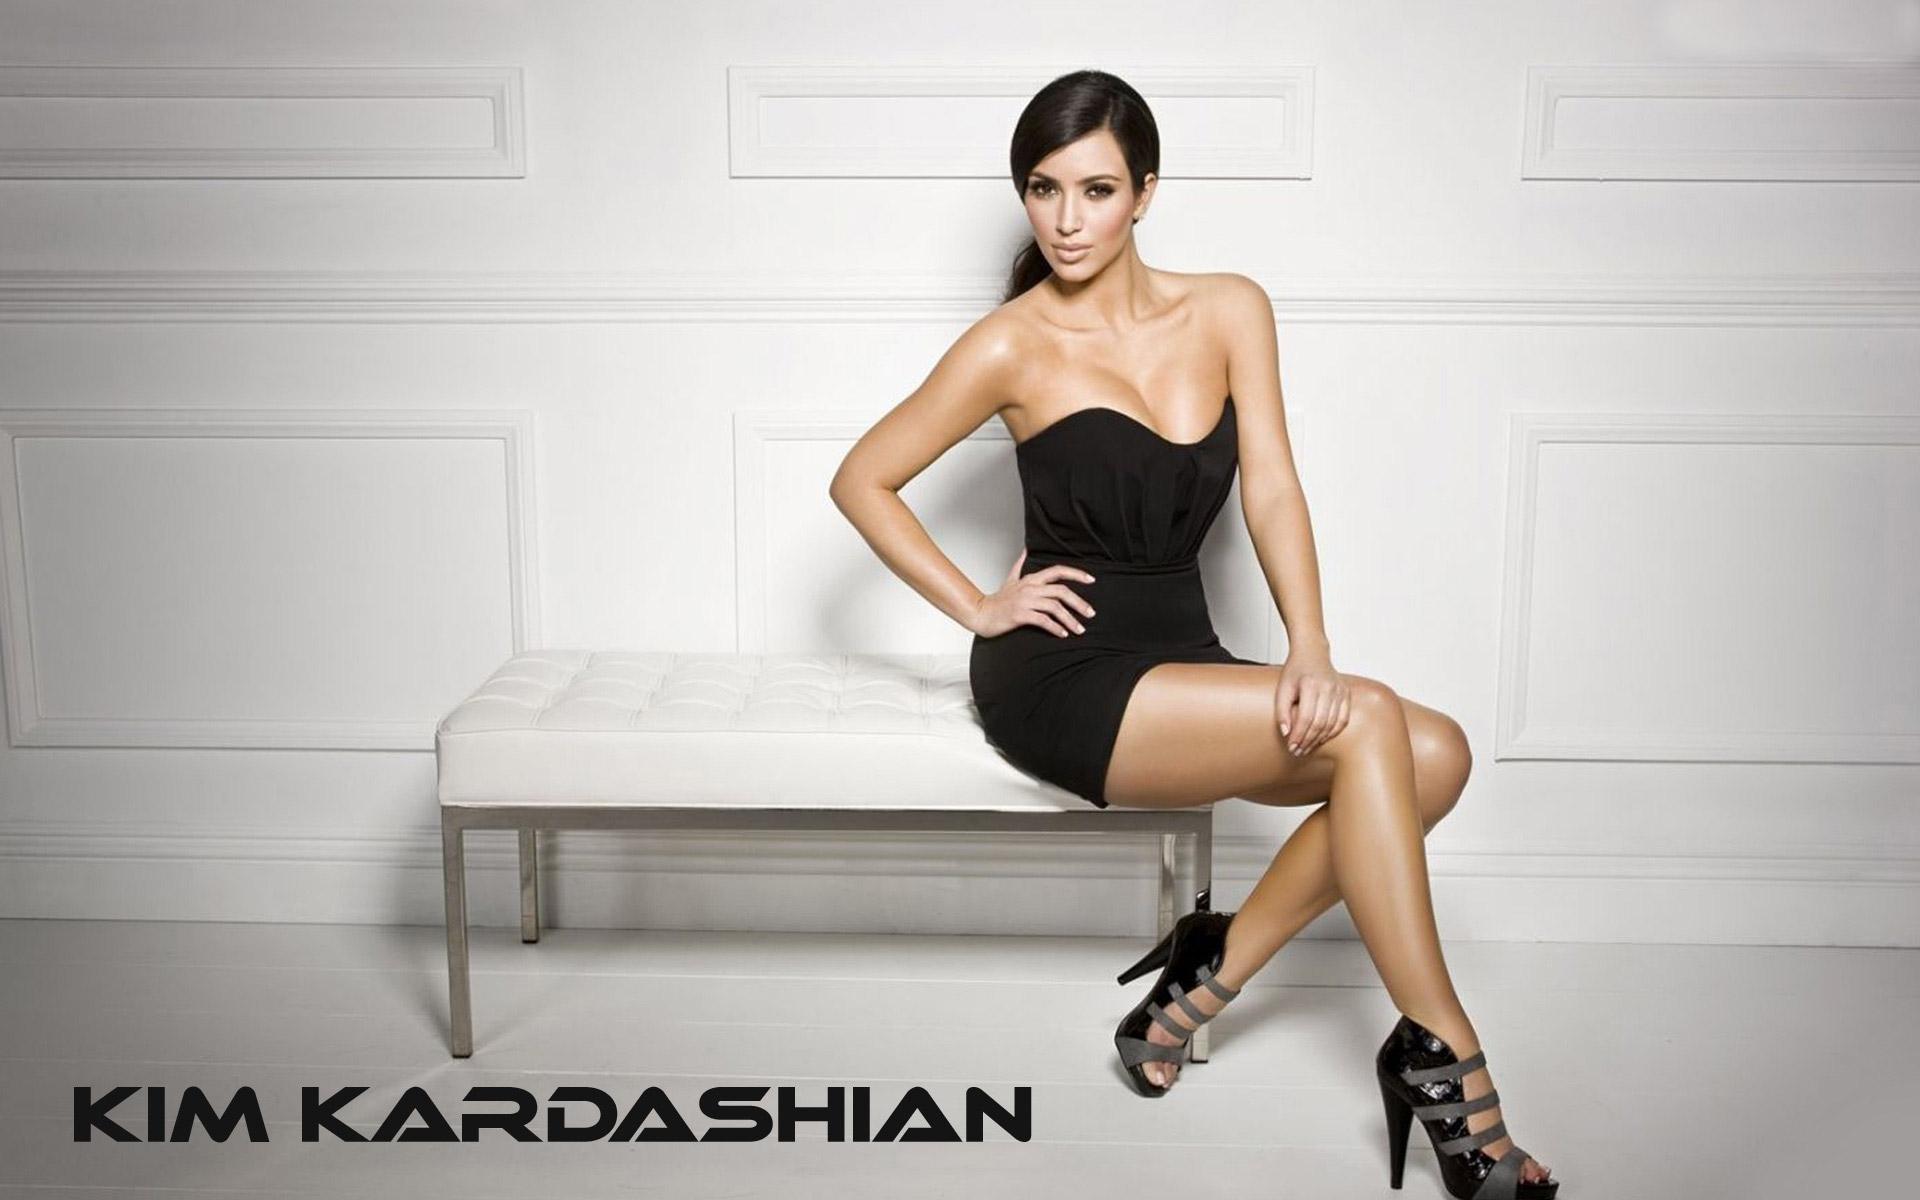 Kim Kardashian Hot HD Wallpapers 11 1920x1200